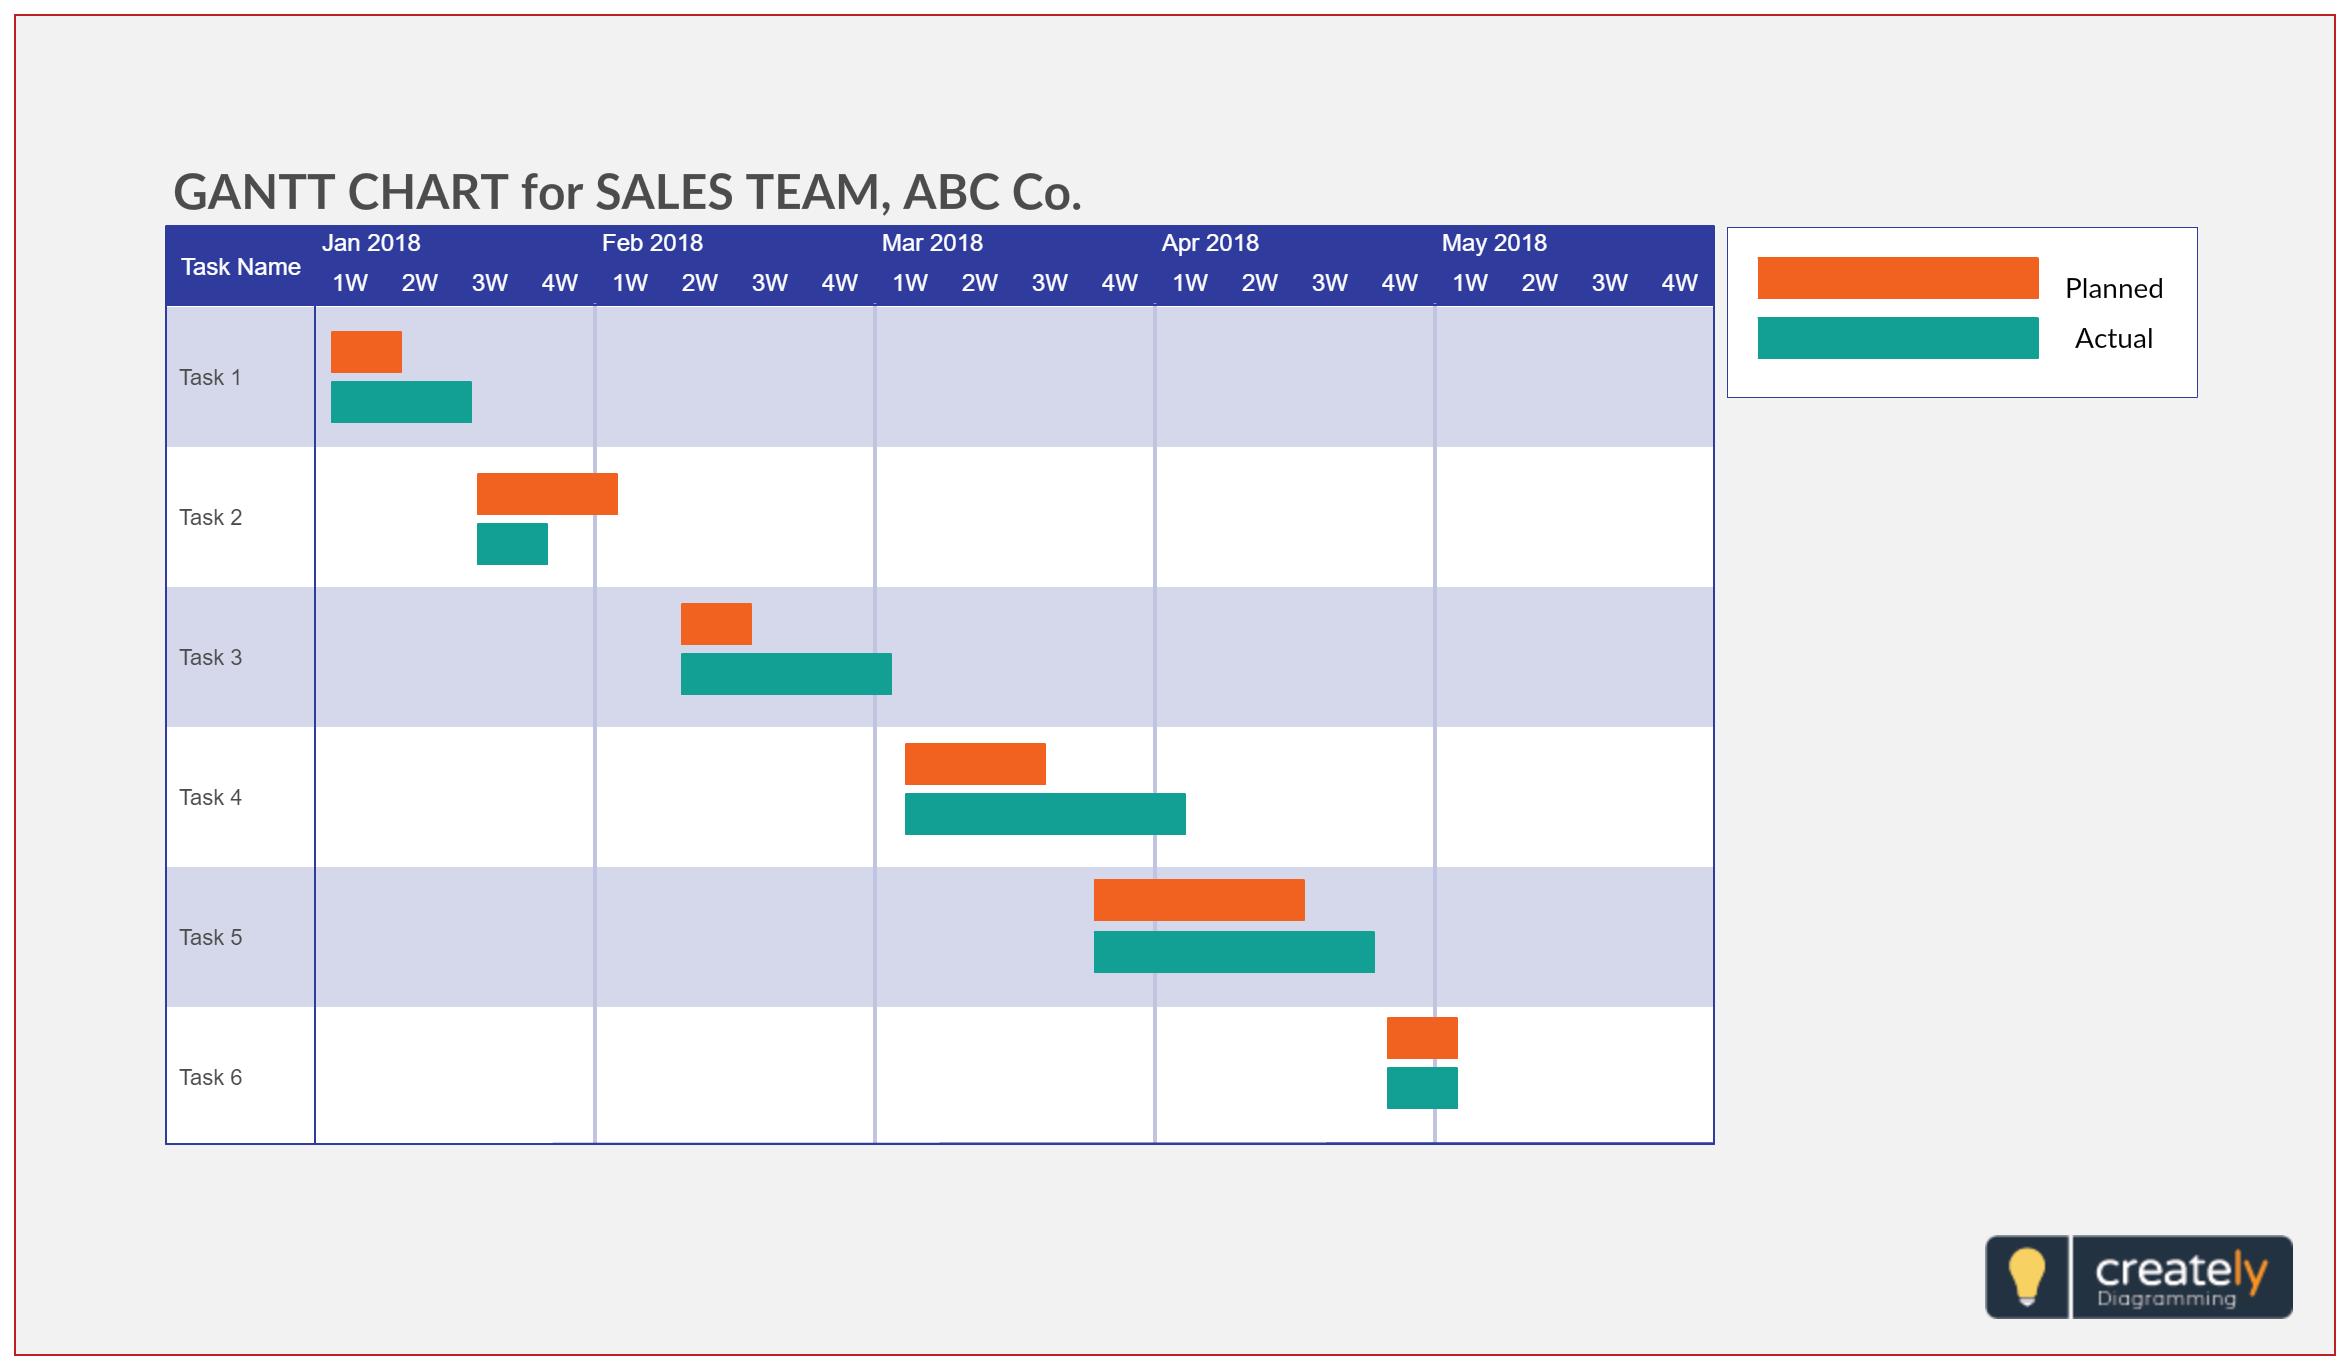 Gantt Chart For Sales Team Track Progress Of Multiple Sales Opportunities From Identification To Close And Follow Up Gantt Chart Templates Gantt Chart Gantt